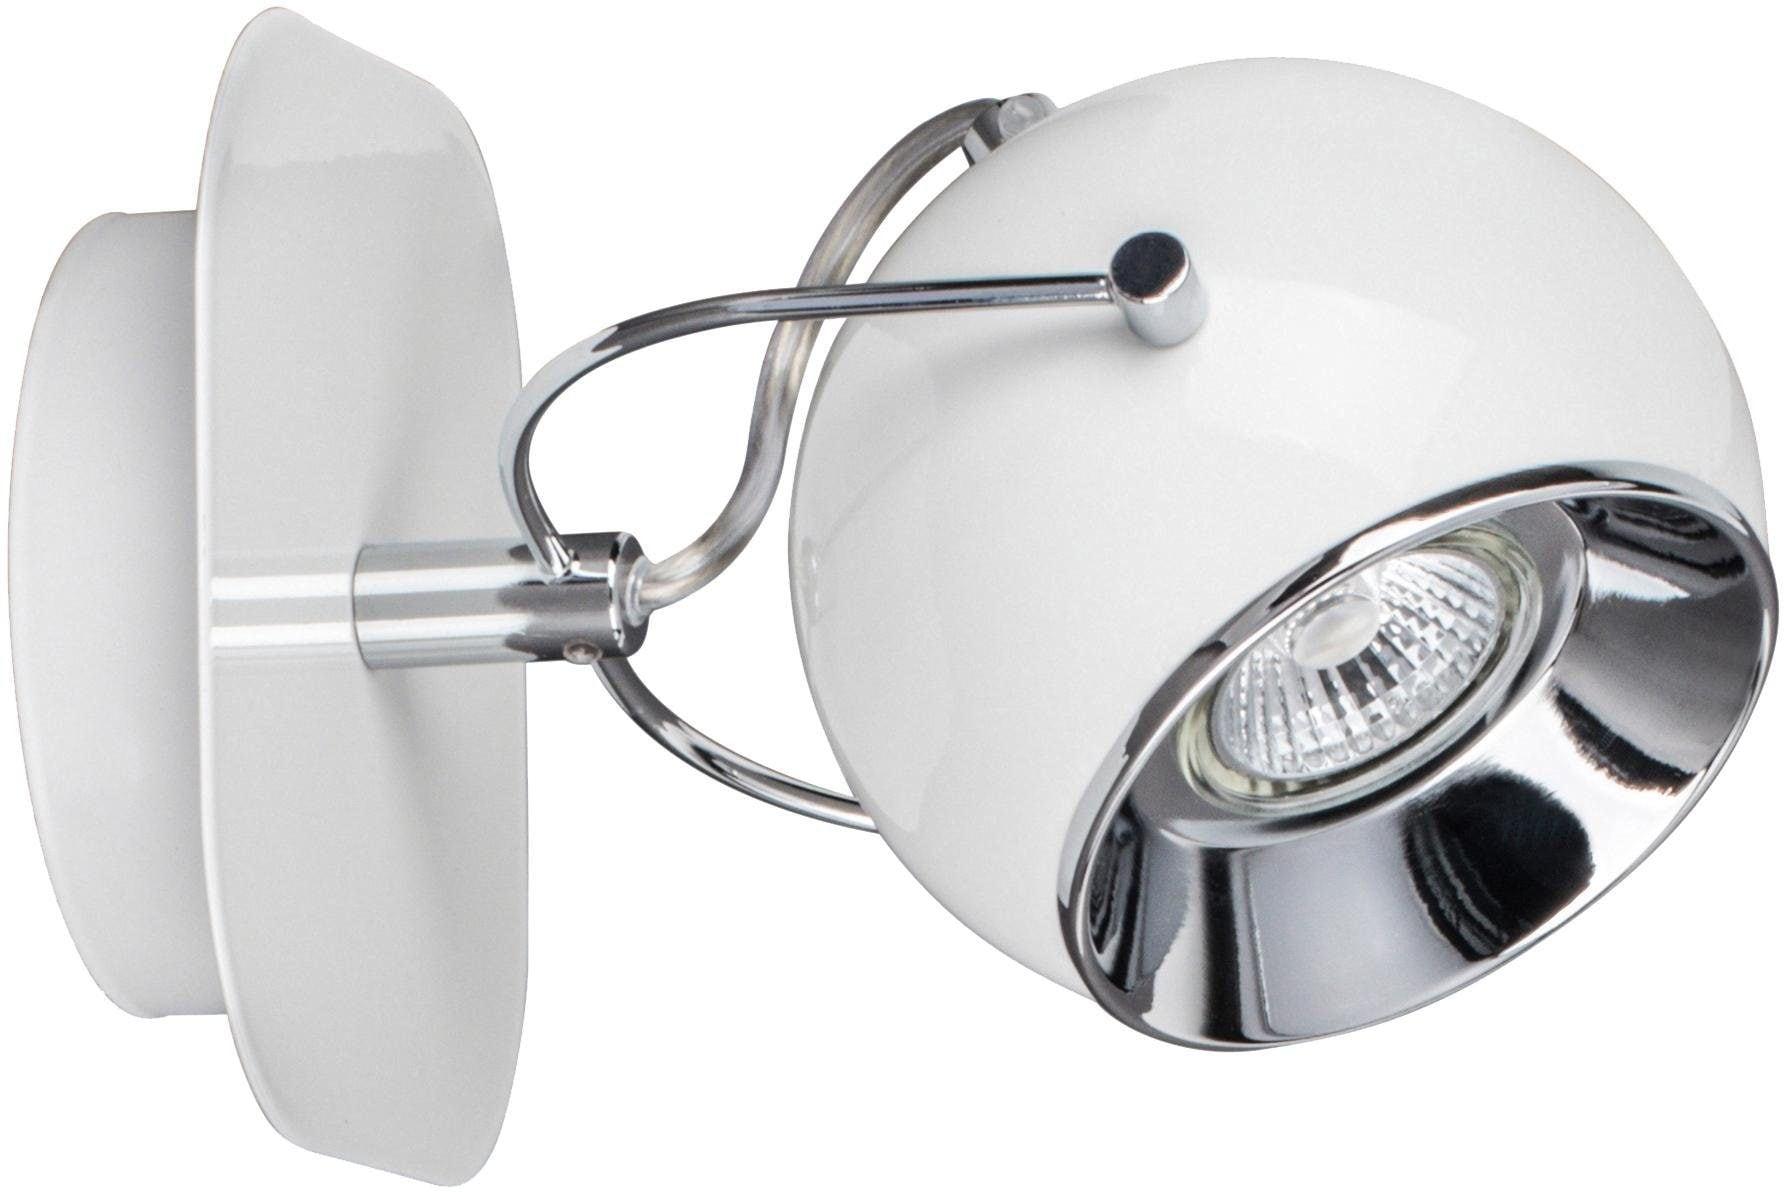 SPOT Light Wandleuchte BALL, GU10, Warmweiß, LED Leuchtmittel Inklusive, wechselbar, schwenkbarer und flexibler Retrostrahler